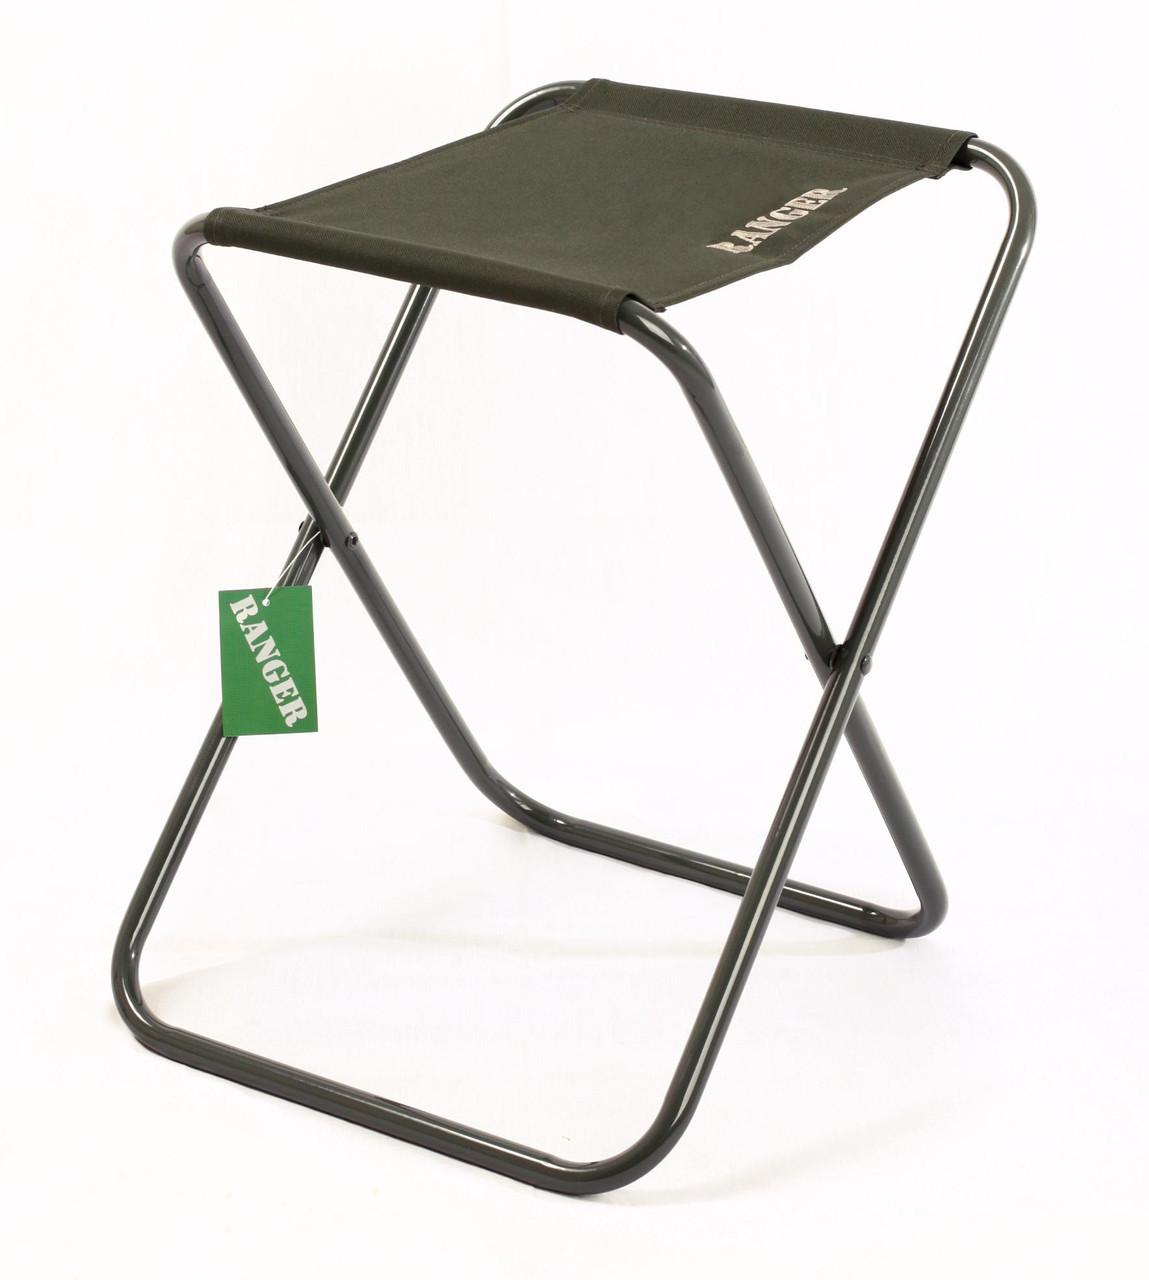 Складной рыбацкий стул без спинки Ranger ingul  (RA 4416) нагрузка 100кг